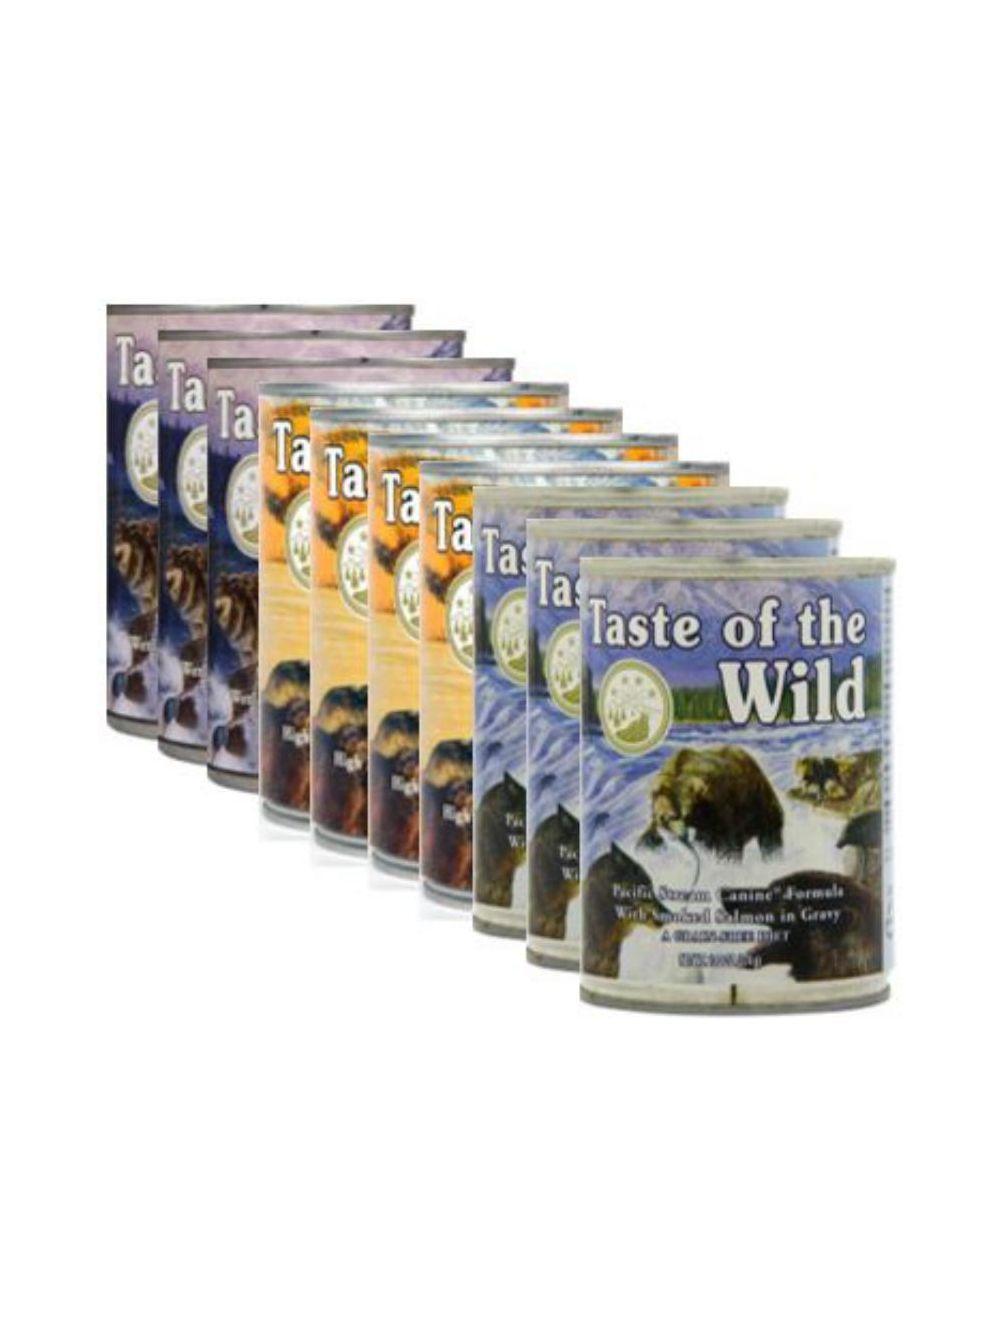 Taste of the wild Lata Multisabor Pague 9 lleve 10